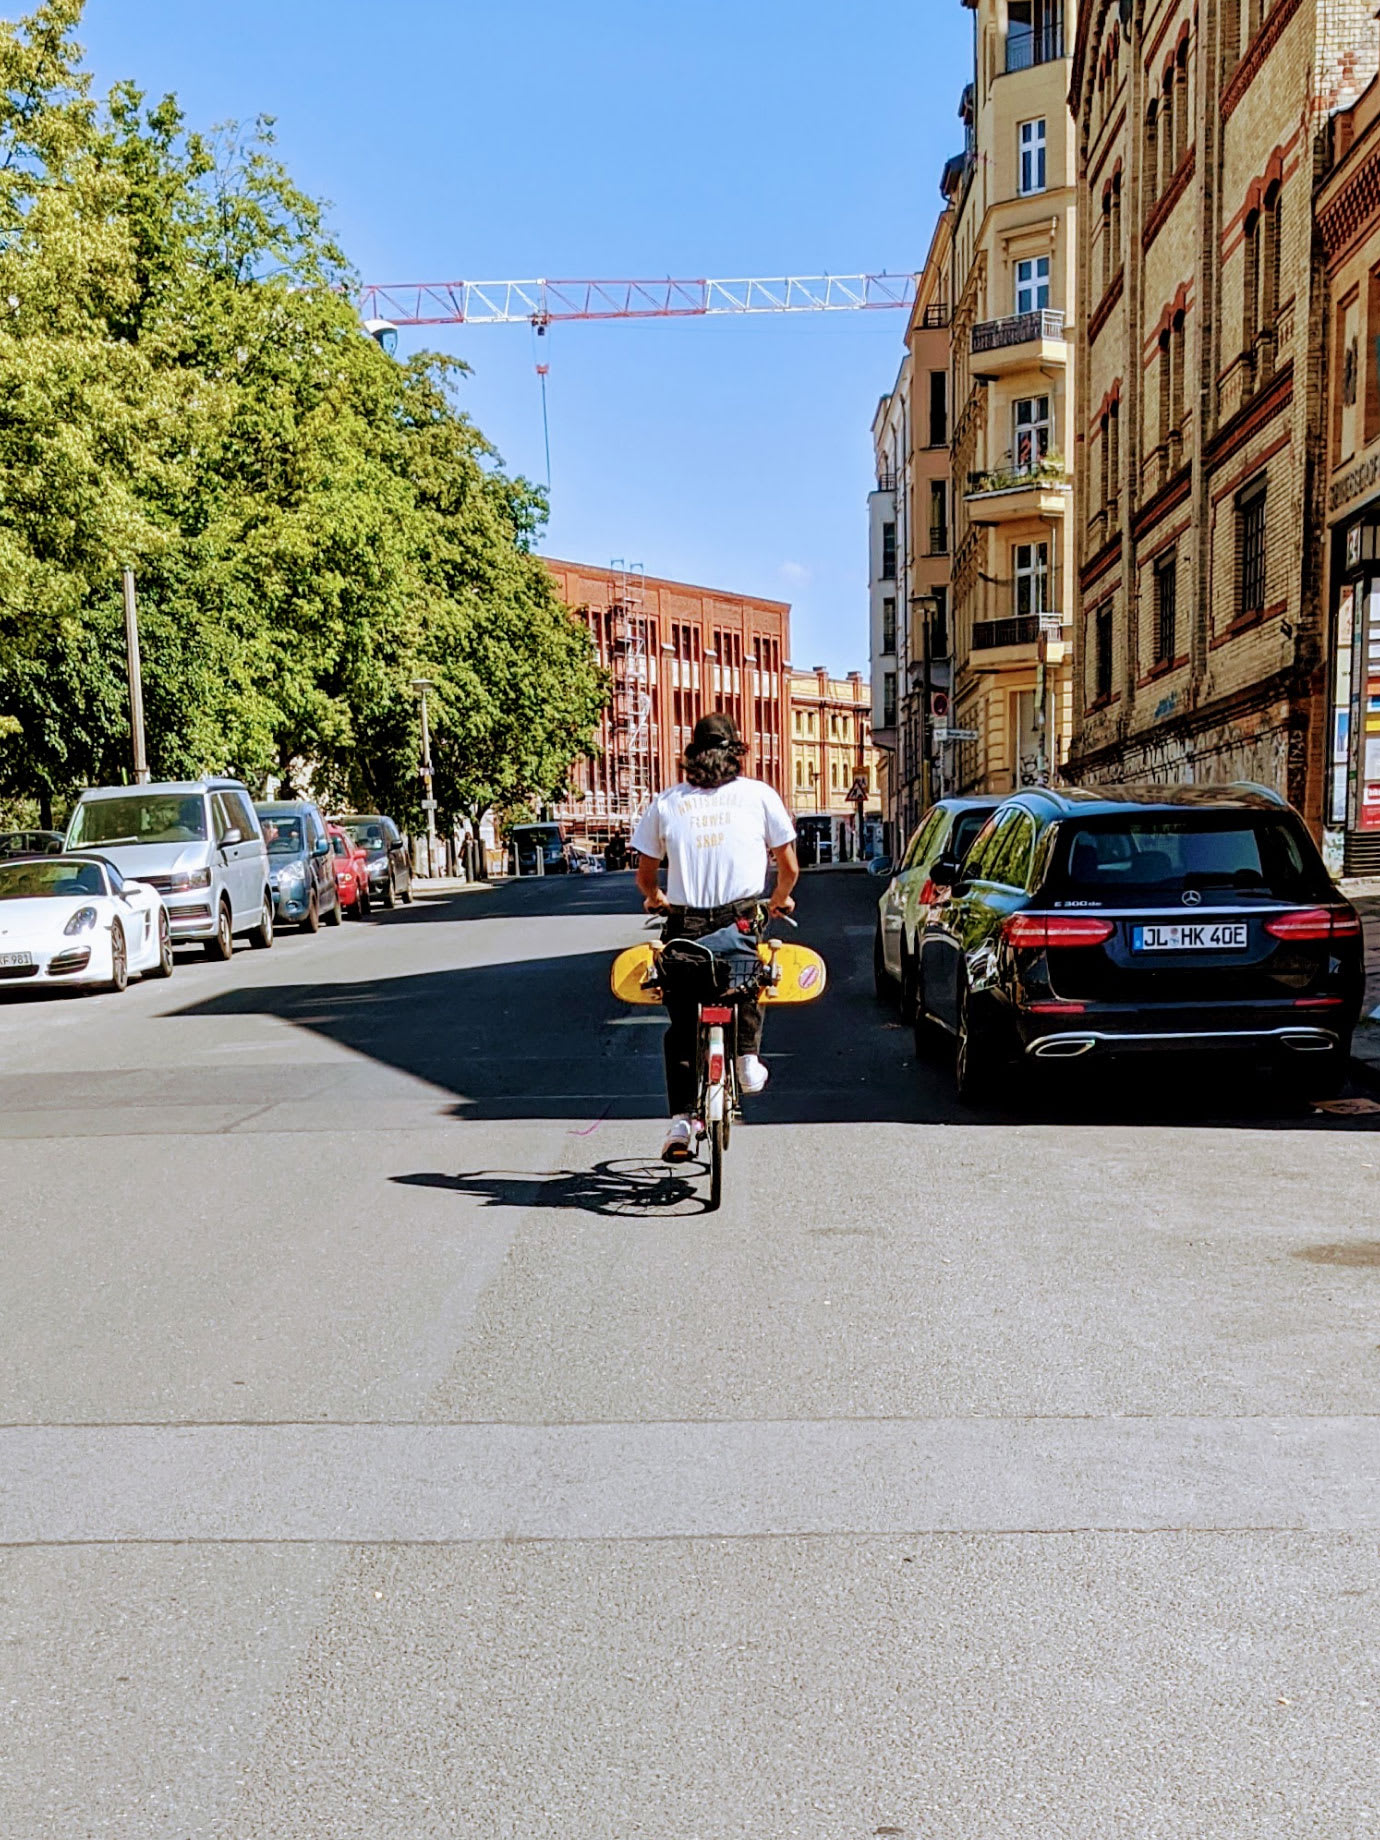 A man cycling down a city street.